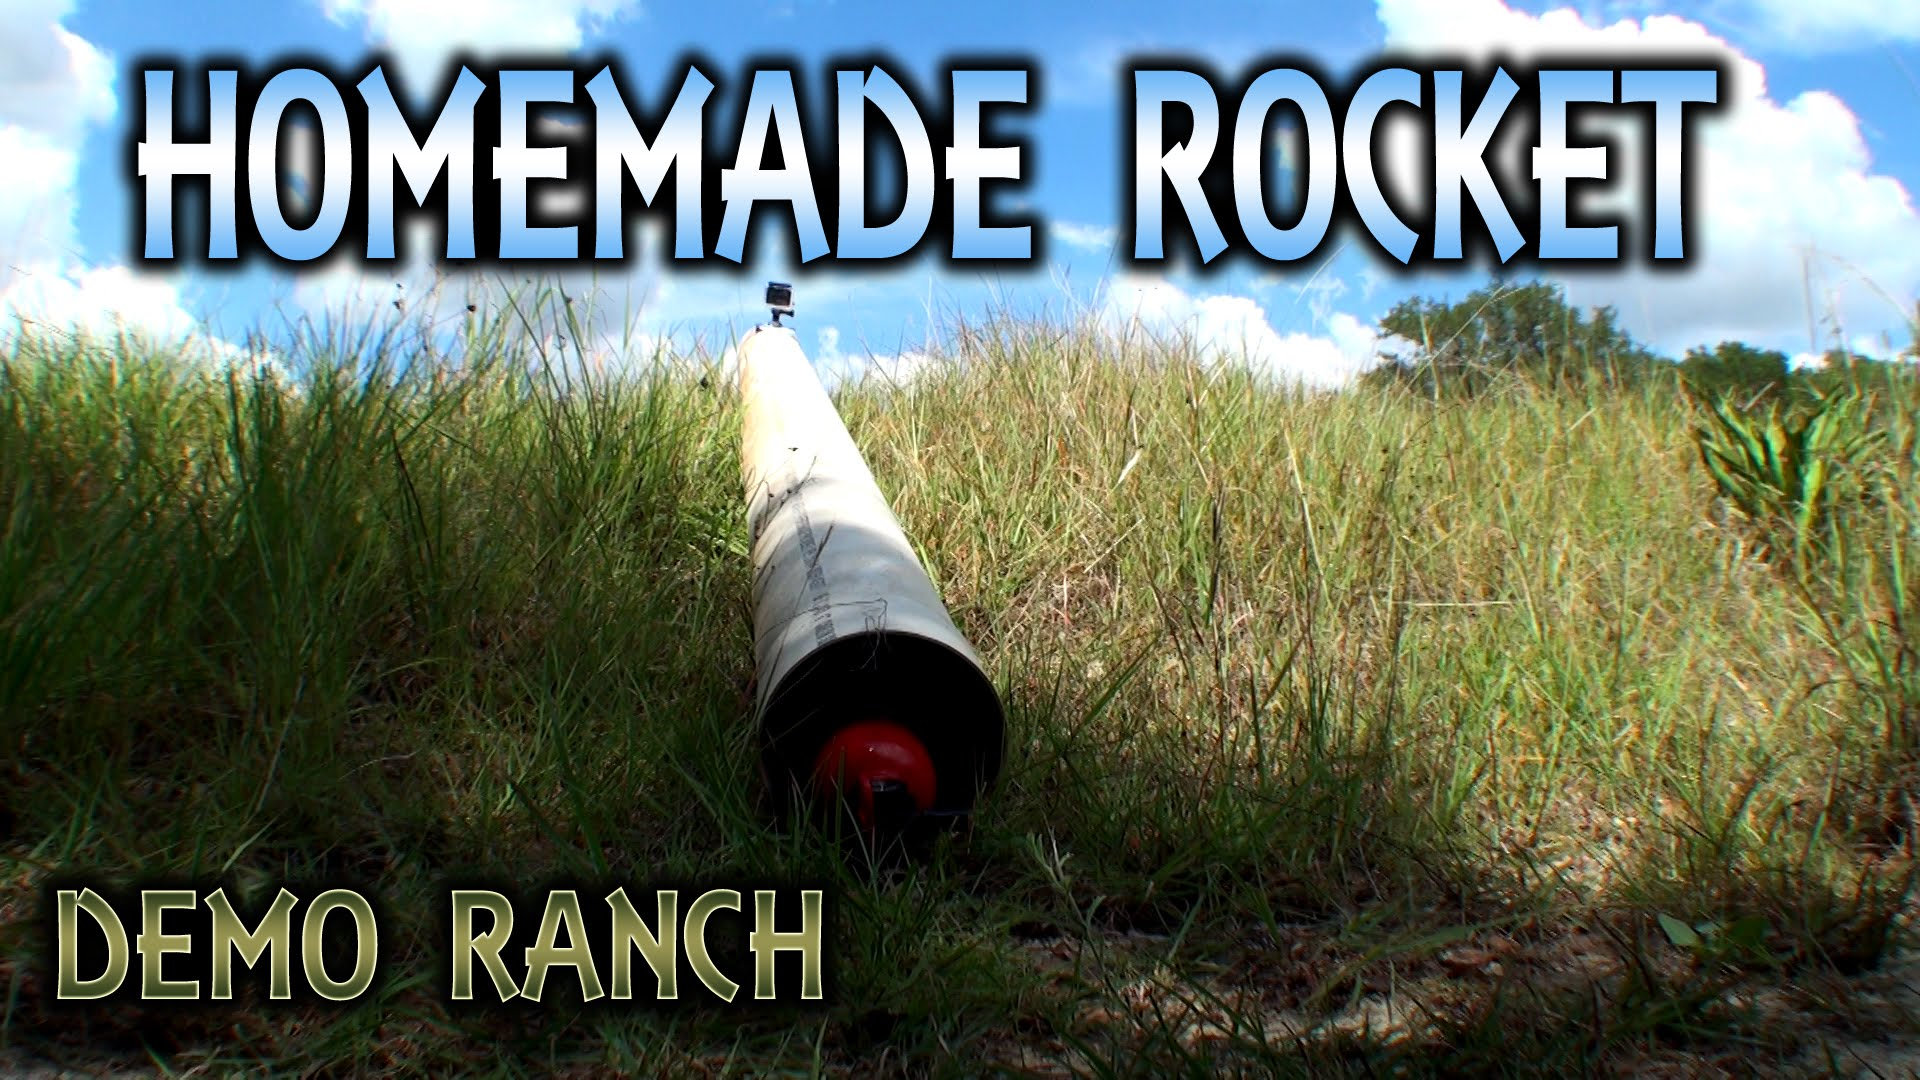 Mossberg Shotgun Ignited Fire Extinguisher Rocket